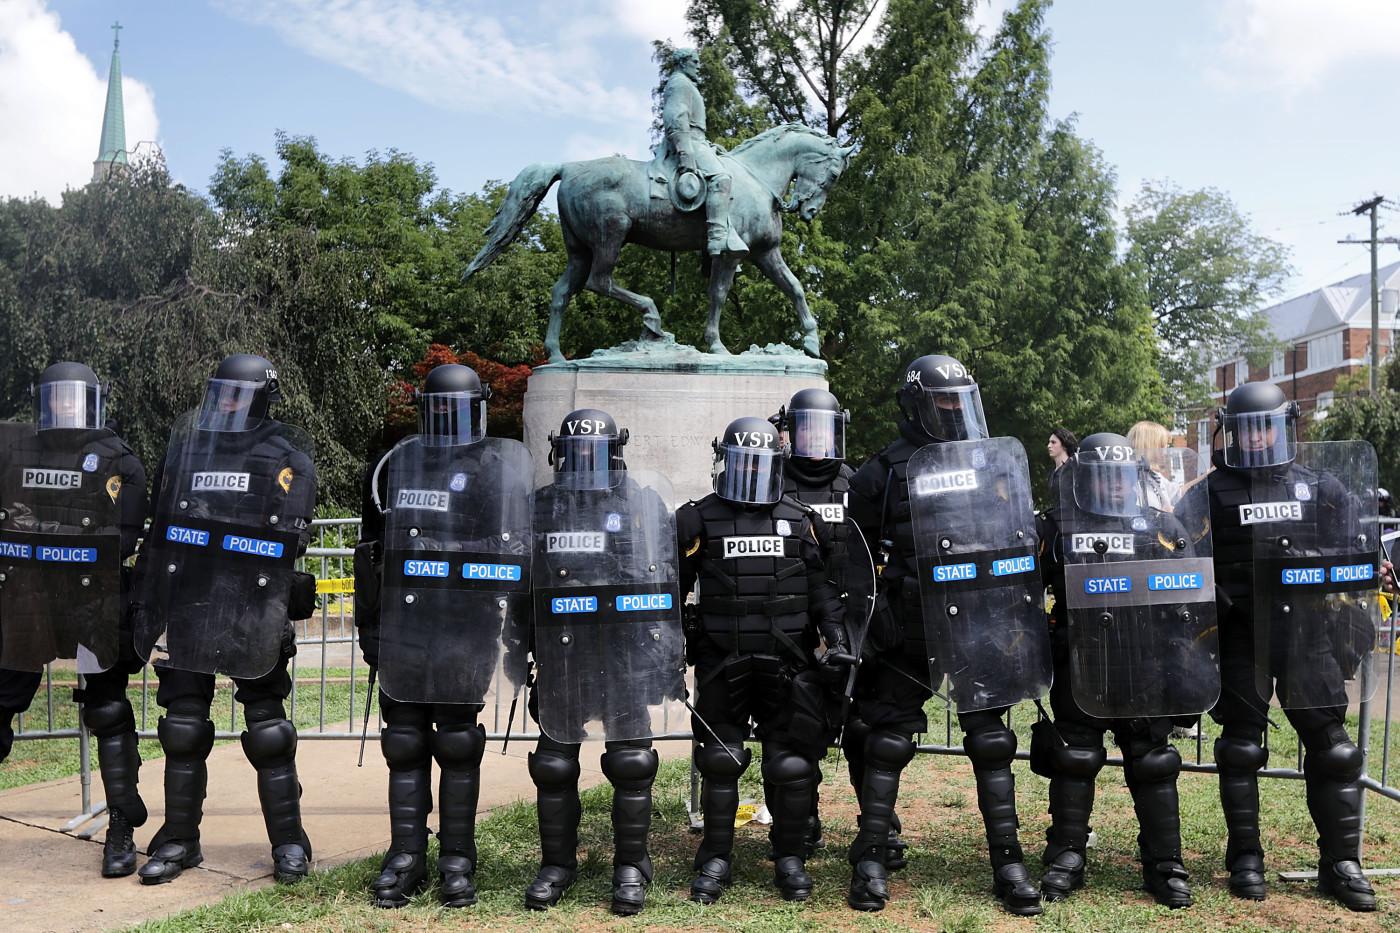 Virginia State Police